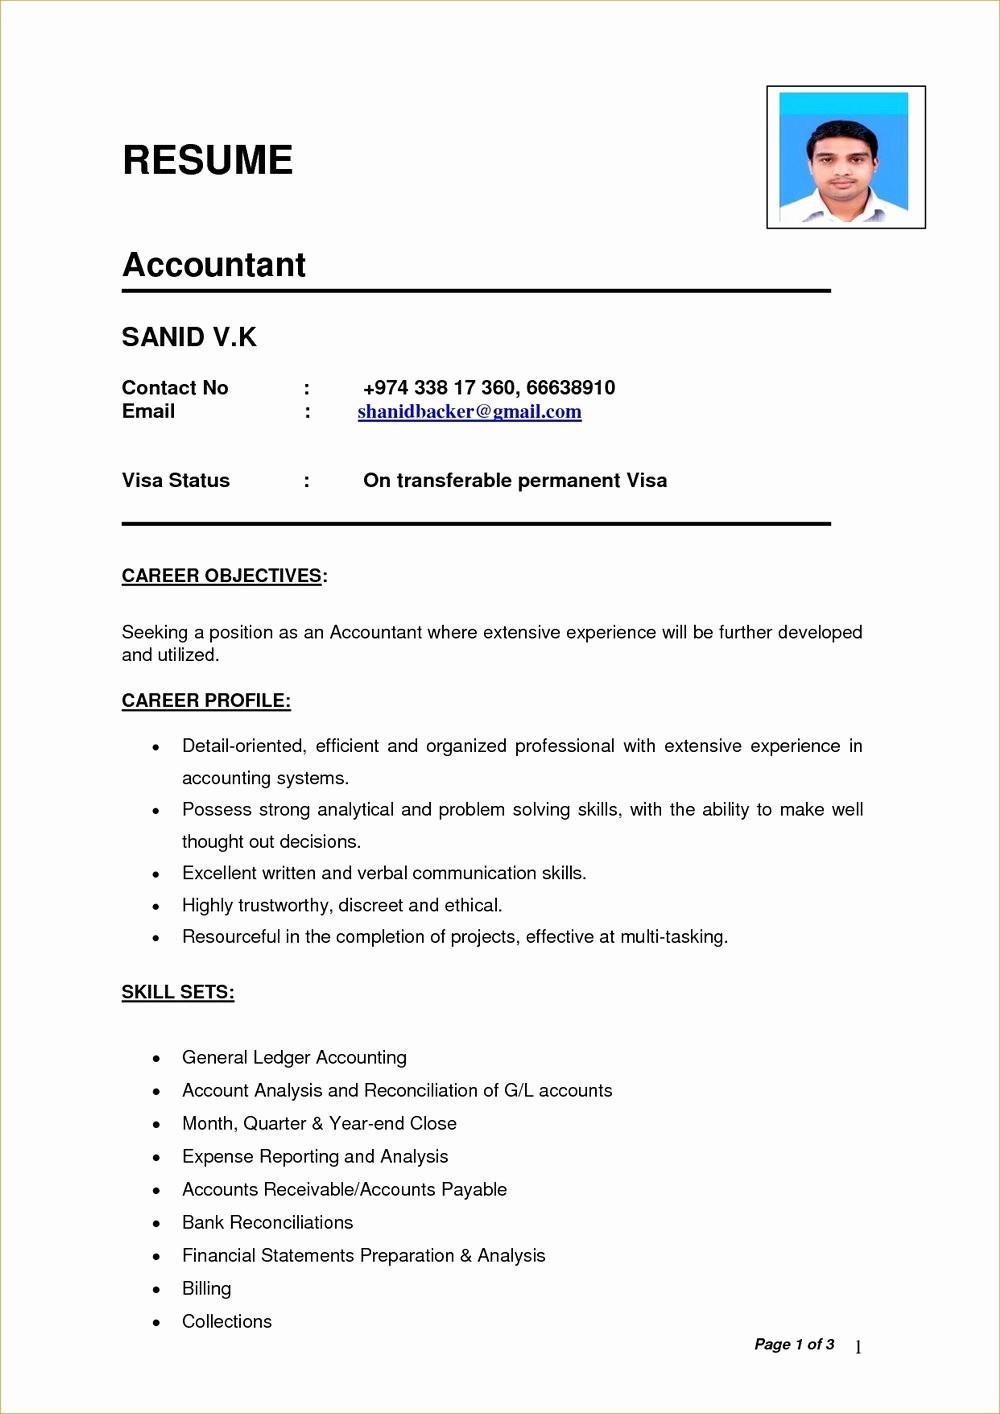 Resume format In Microsoft Word Elegant Simple Resume Templates for Word Resumes 201